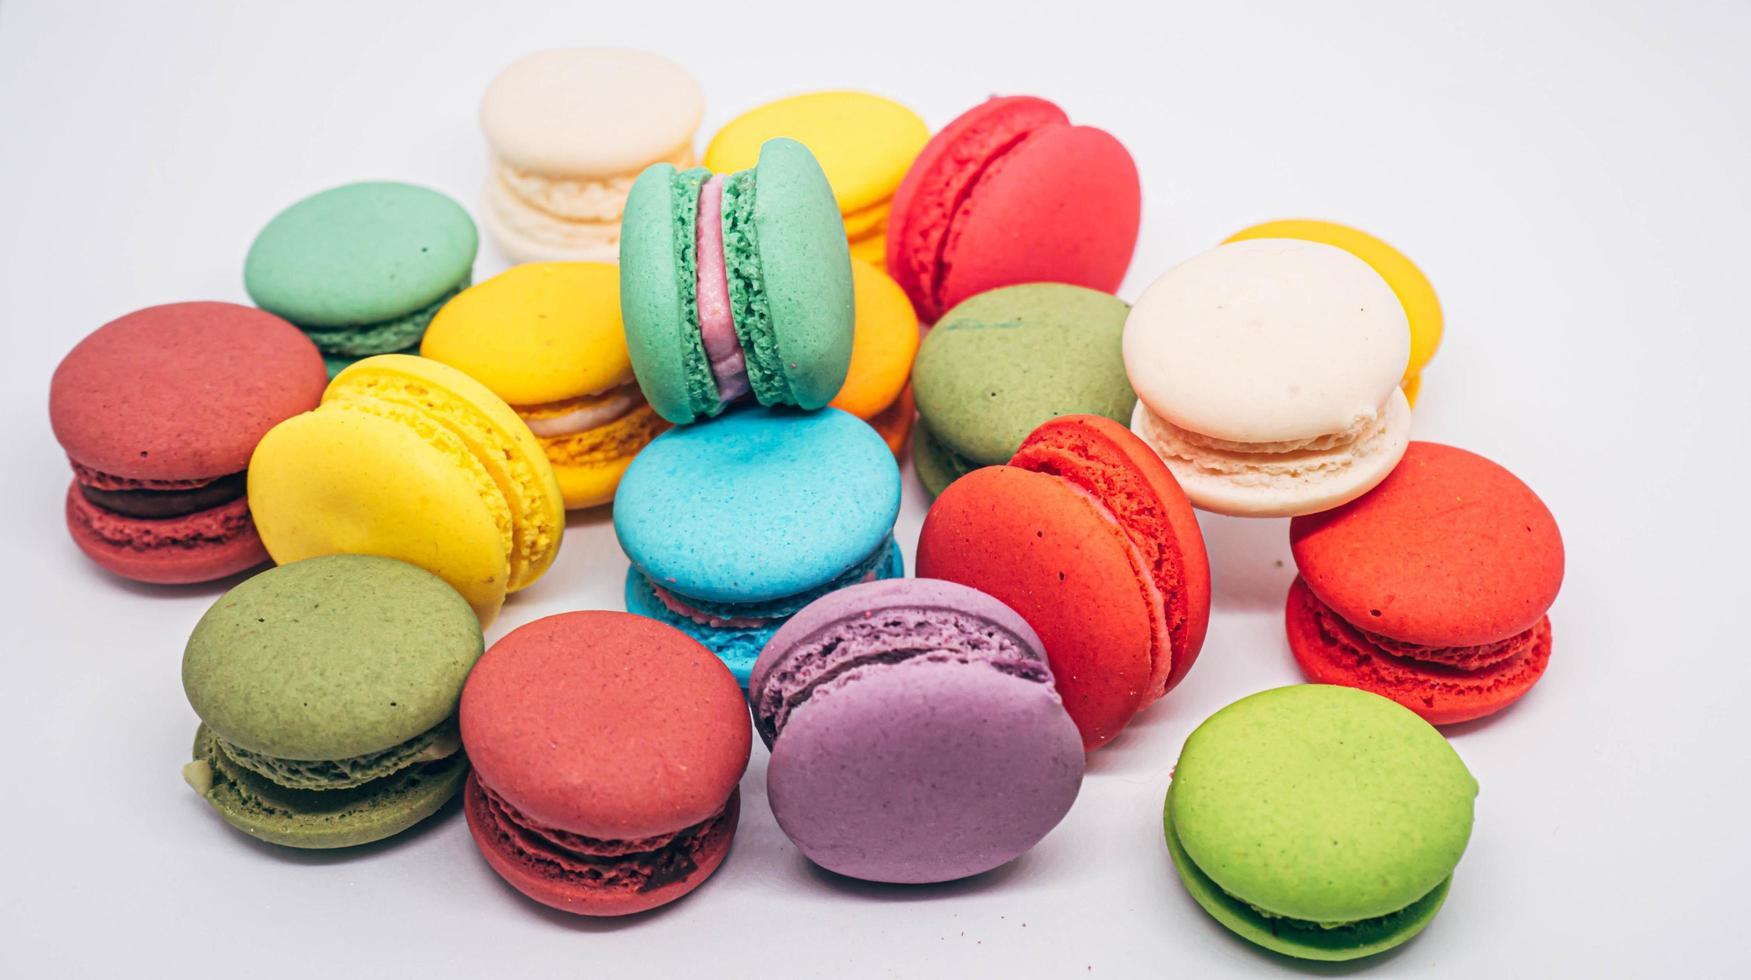 biscuits macaron vibrants photo